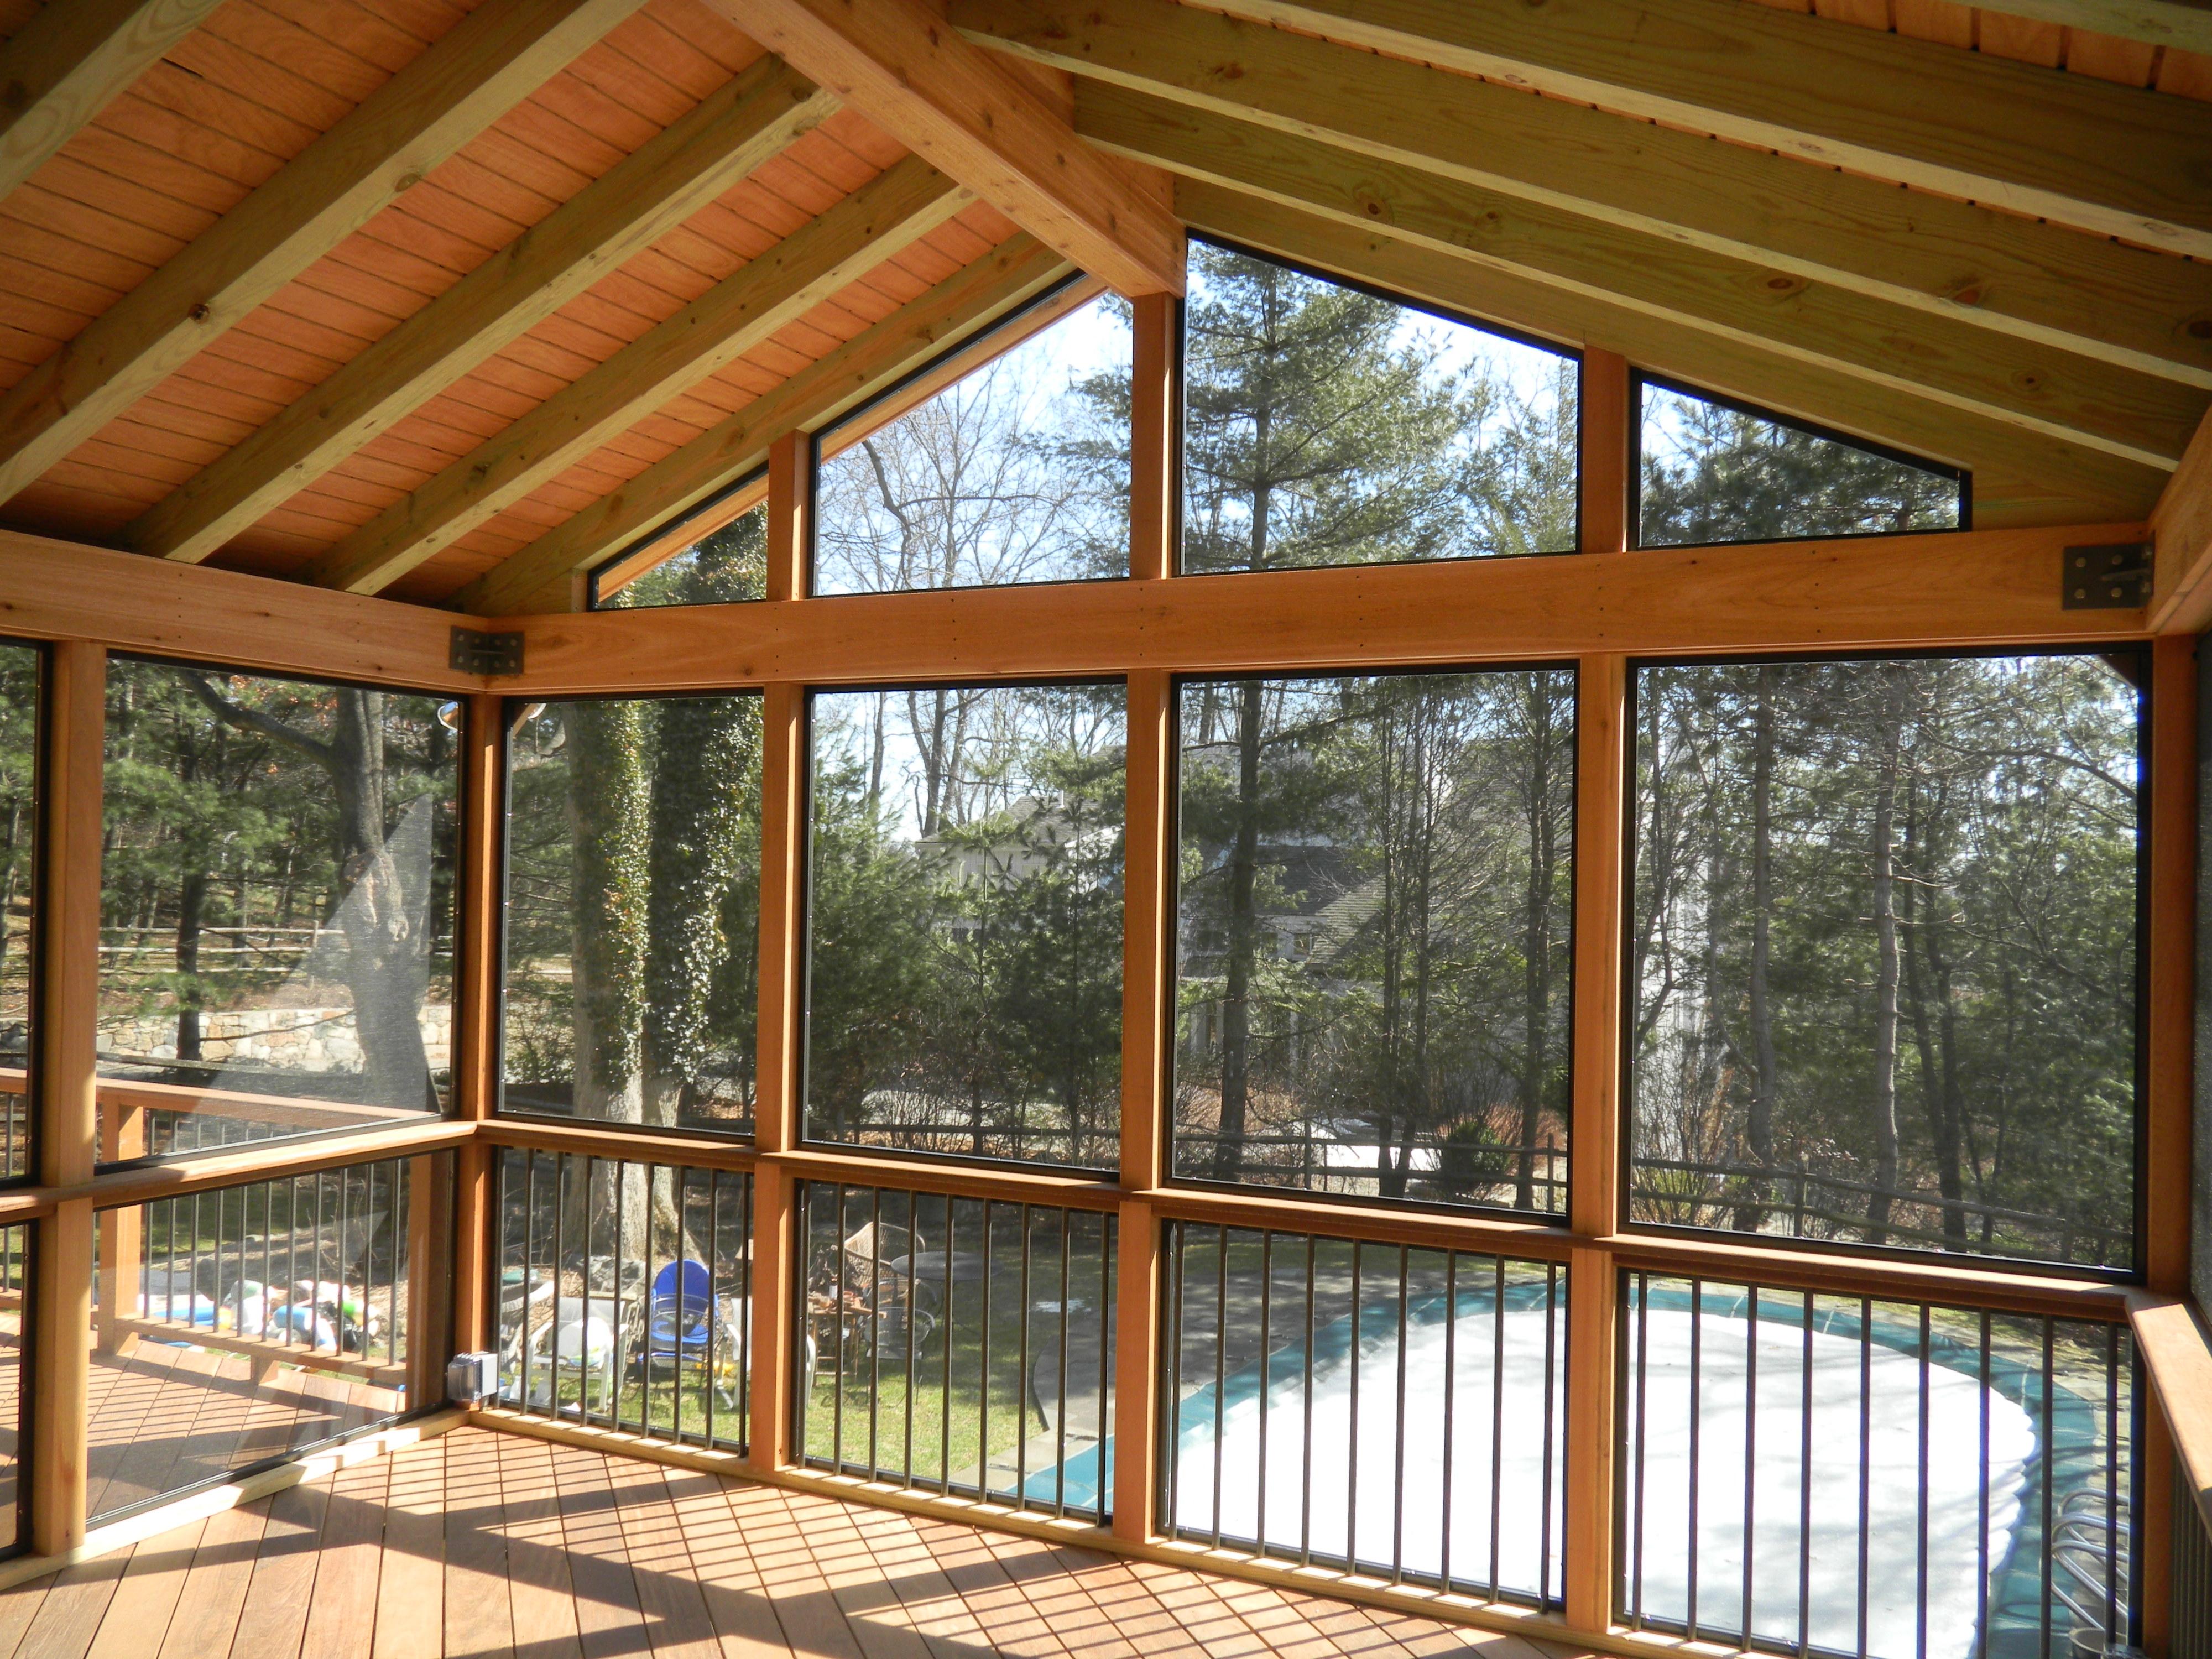 wood under porch ceiling amazing brushed bronze frames custom screen regarding sizing 4000 x 3000 - Wood Under Porch Ceiling